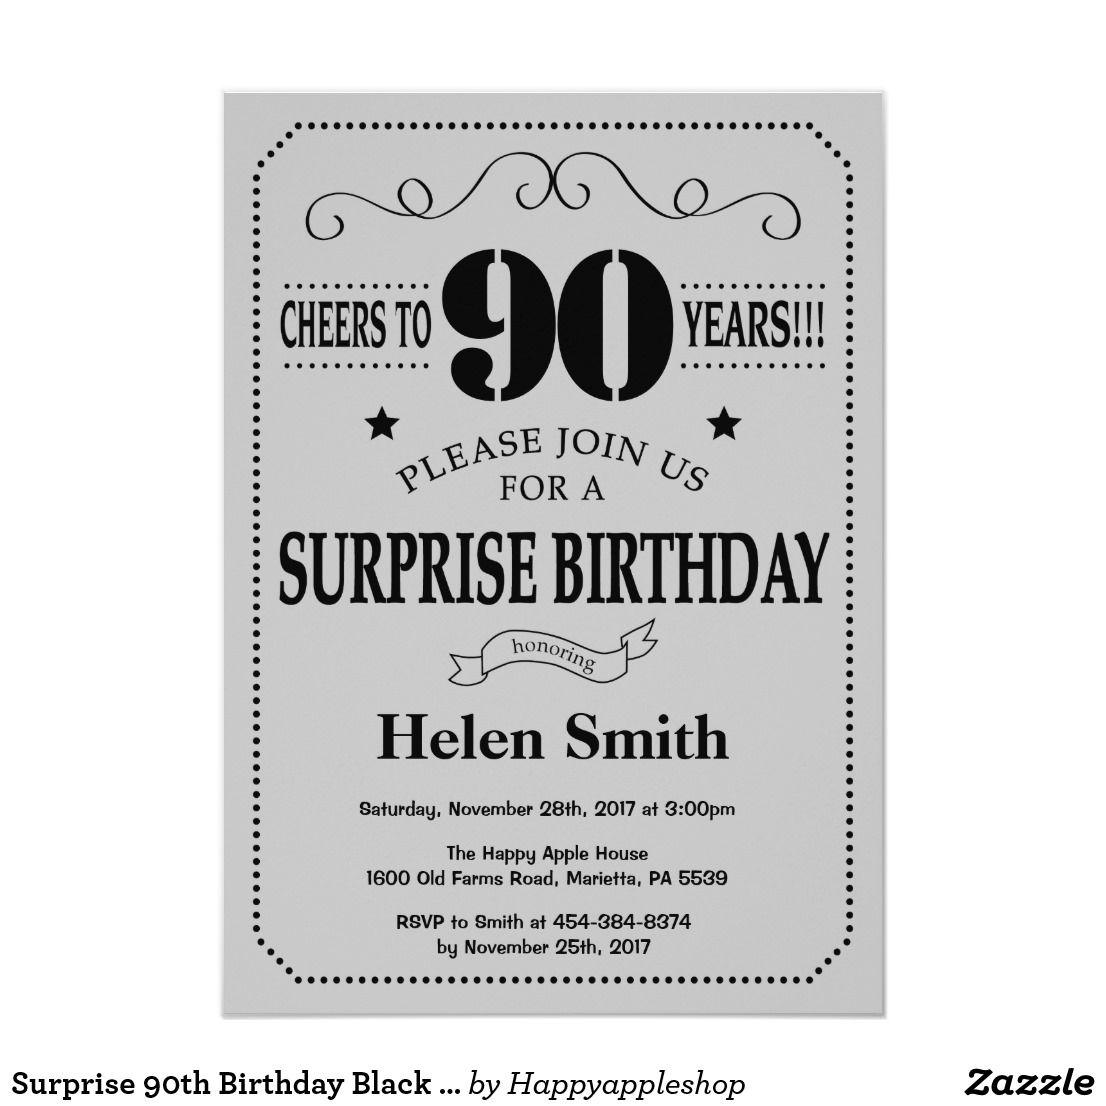 Surprise 90th Birthday Black and Silver Gray Invitation